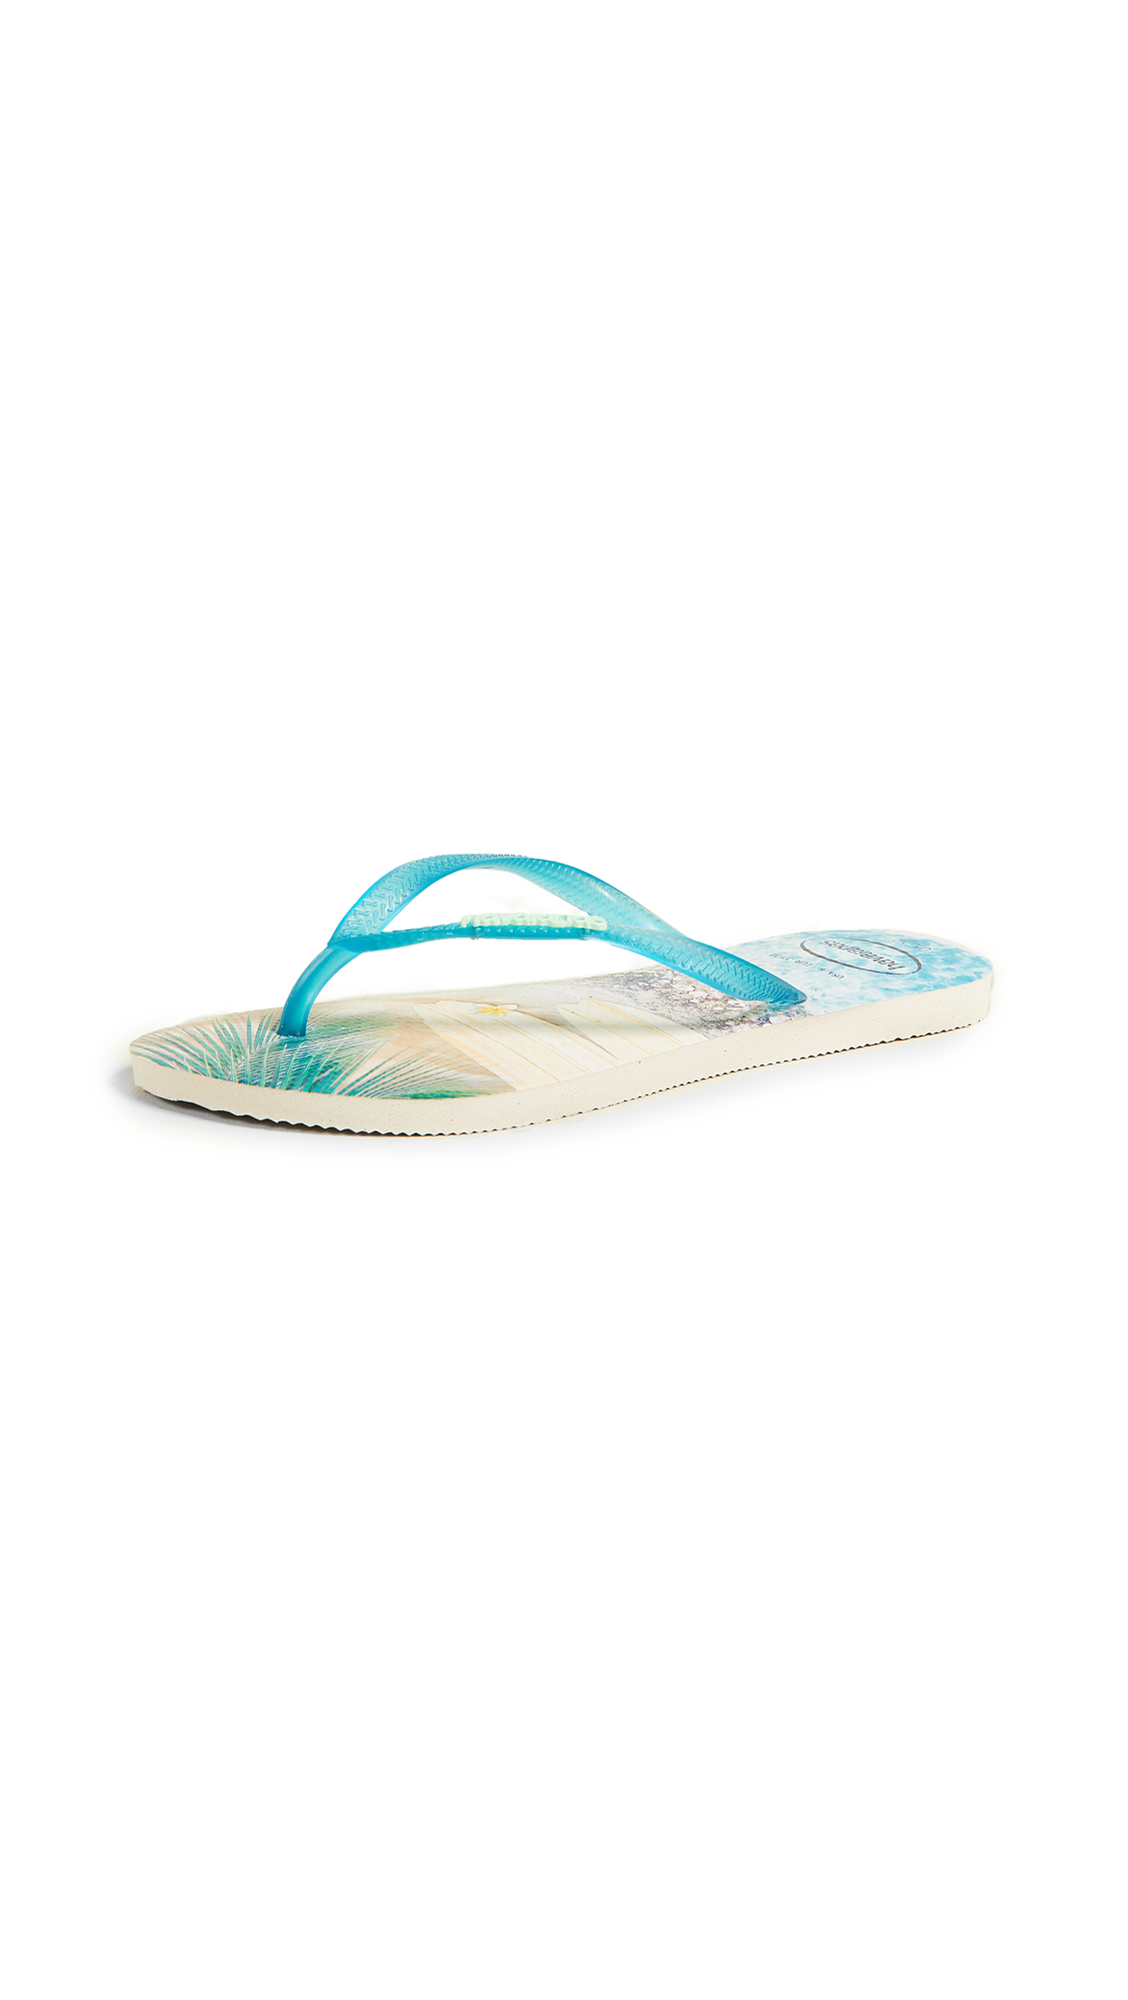 Havaianas Slim Paisage Flip Flops - Beige/Turquoise